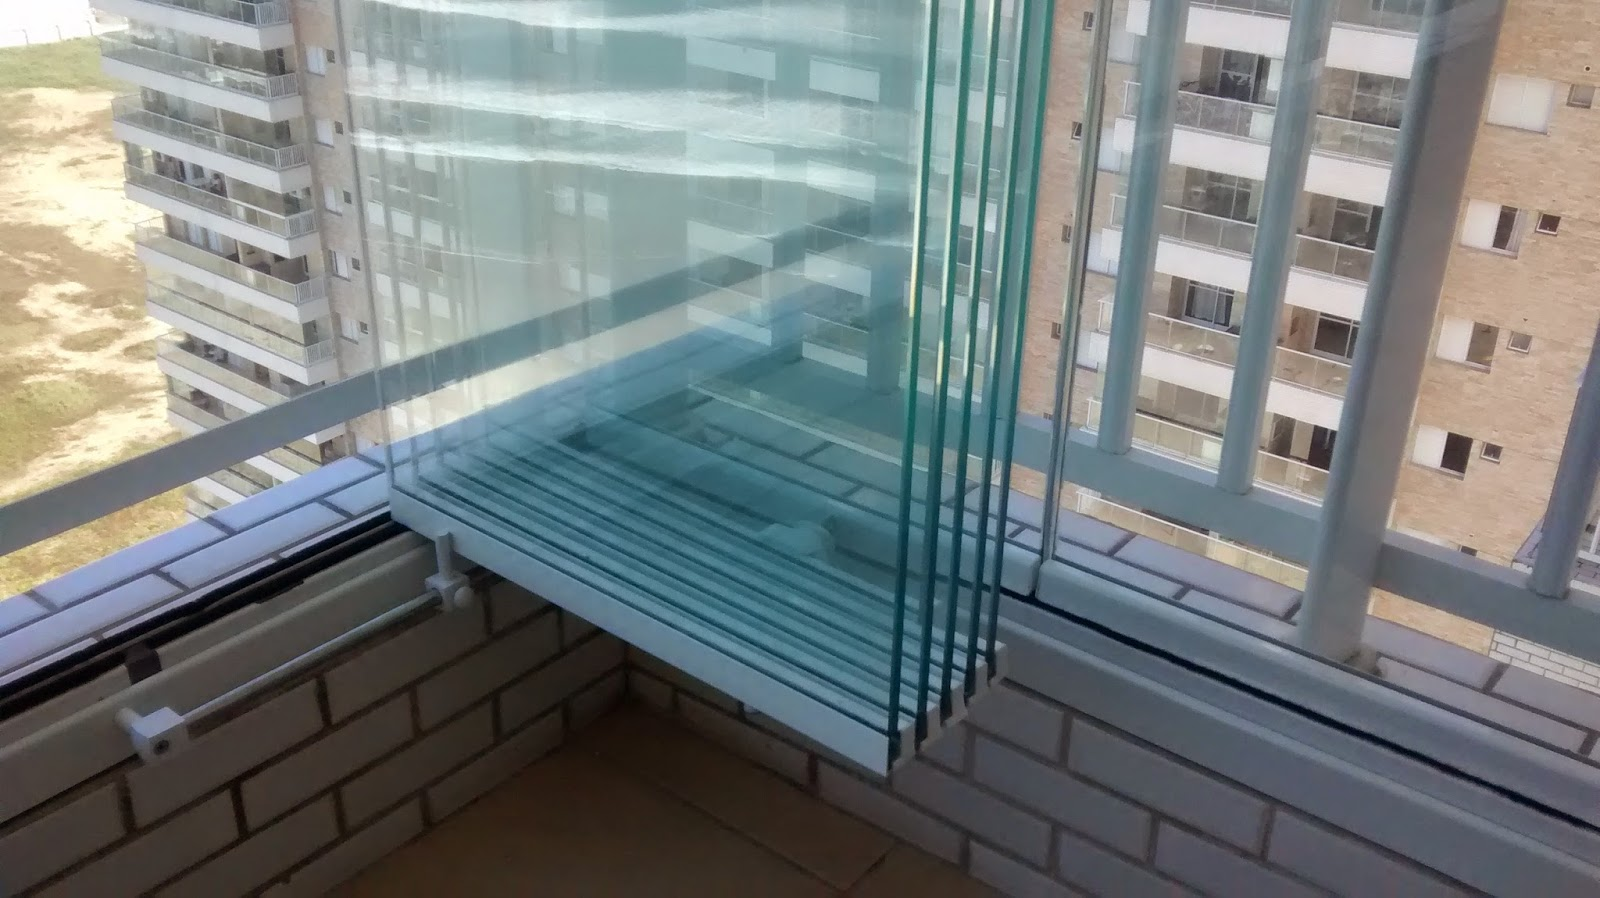 #846E47 vidro temperado x vidro laminado o vidro temperado é um 1756 Janela De Aluminio Ou Vidro Temperado